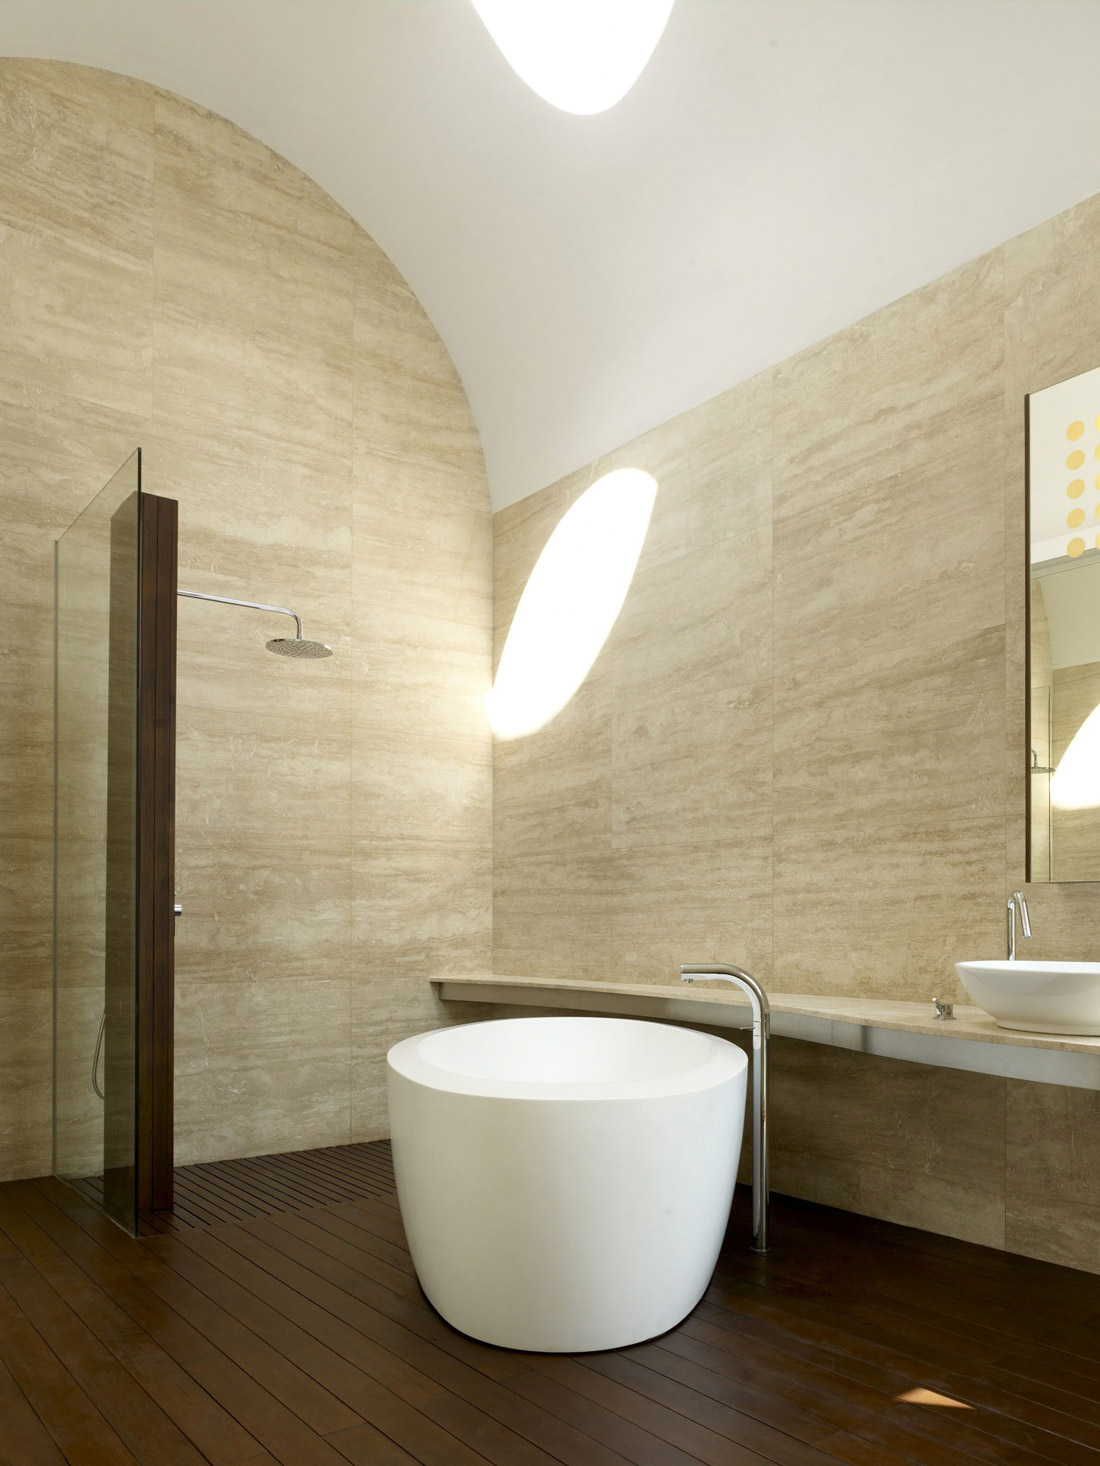 Bath, Shower, Minimalist Contemporary Home in Singapore